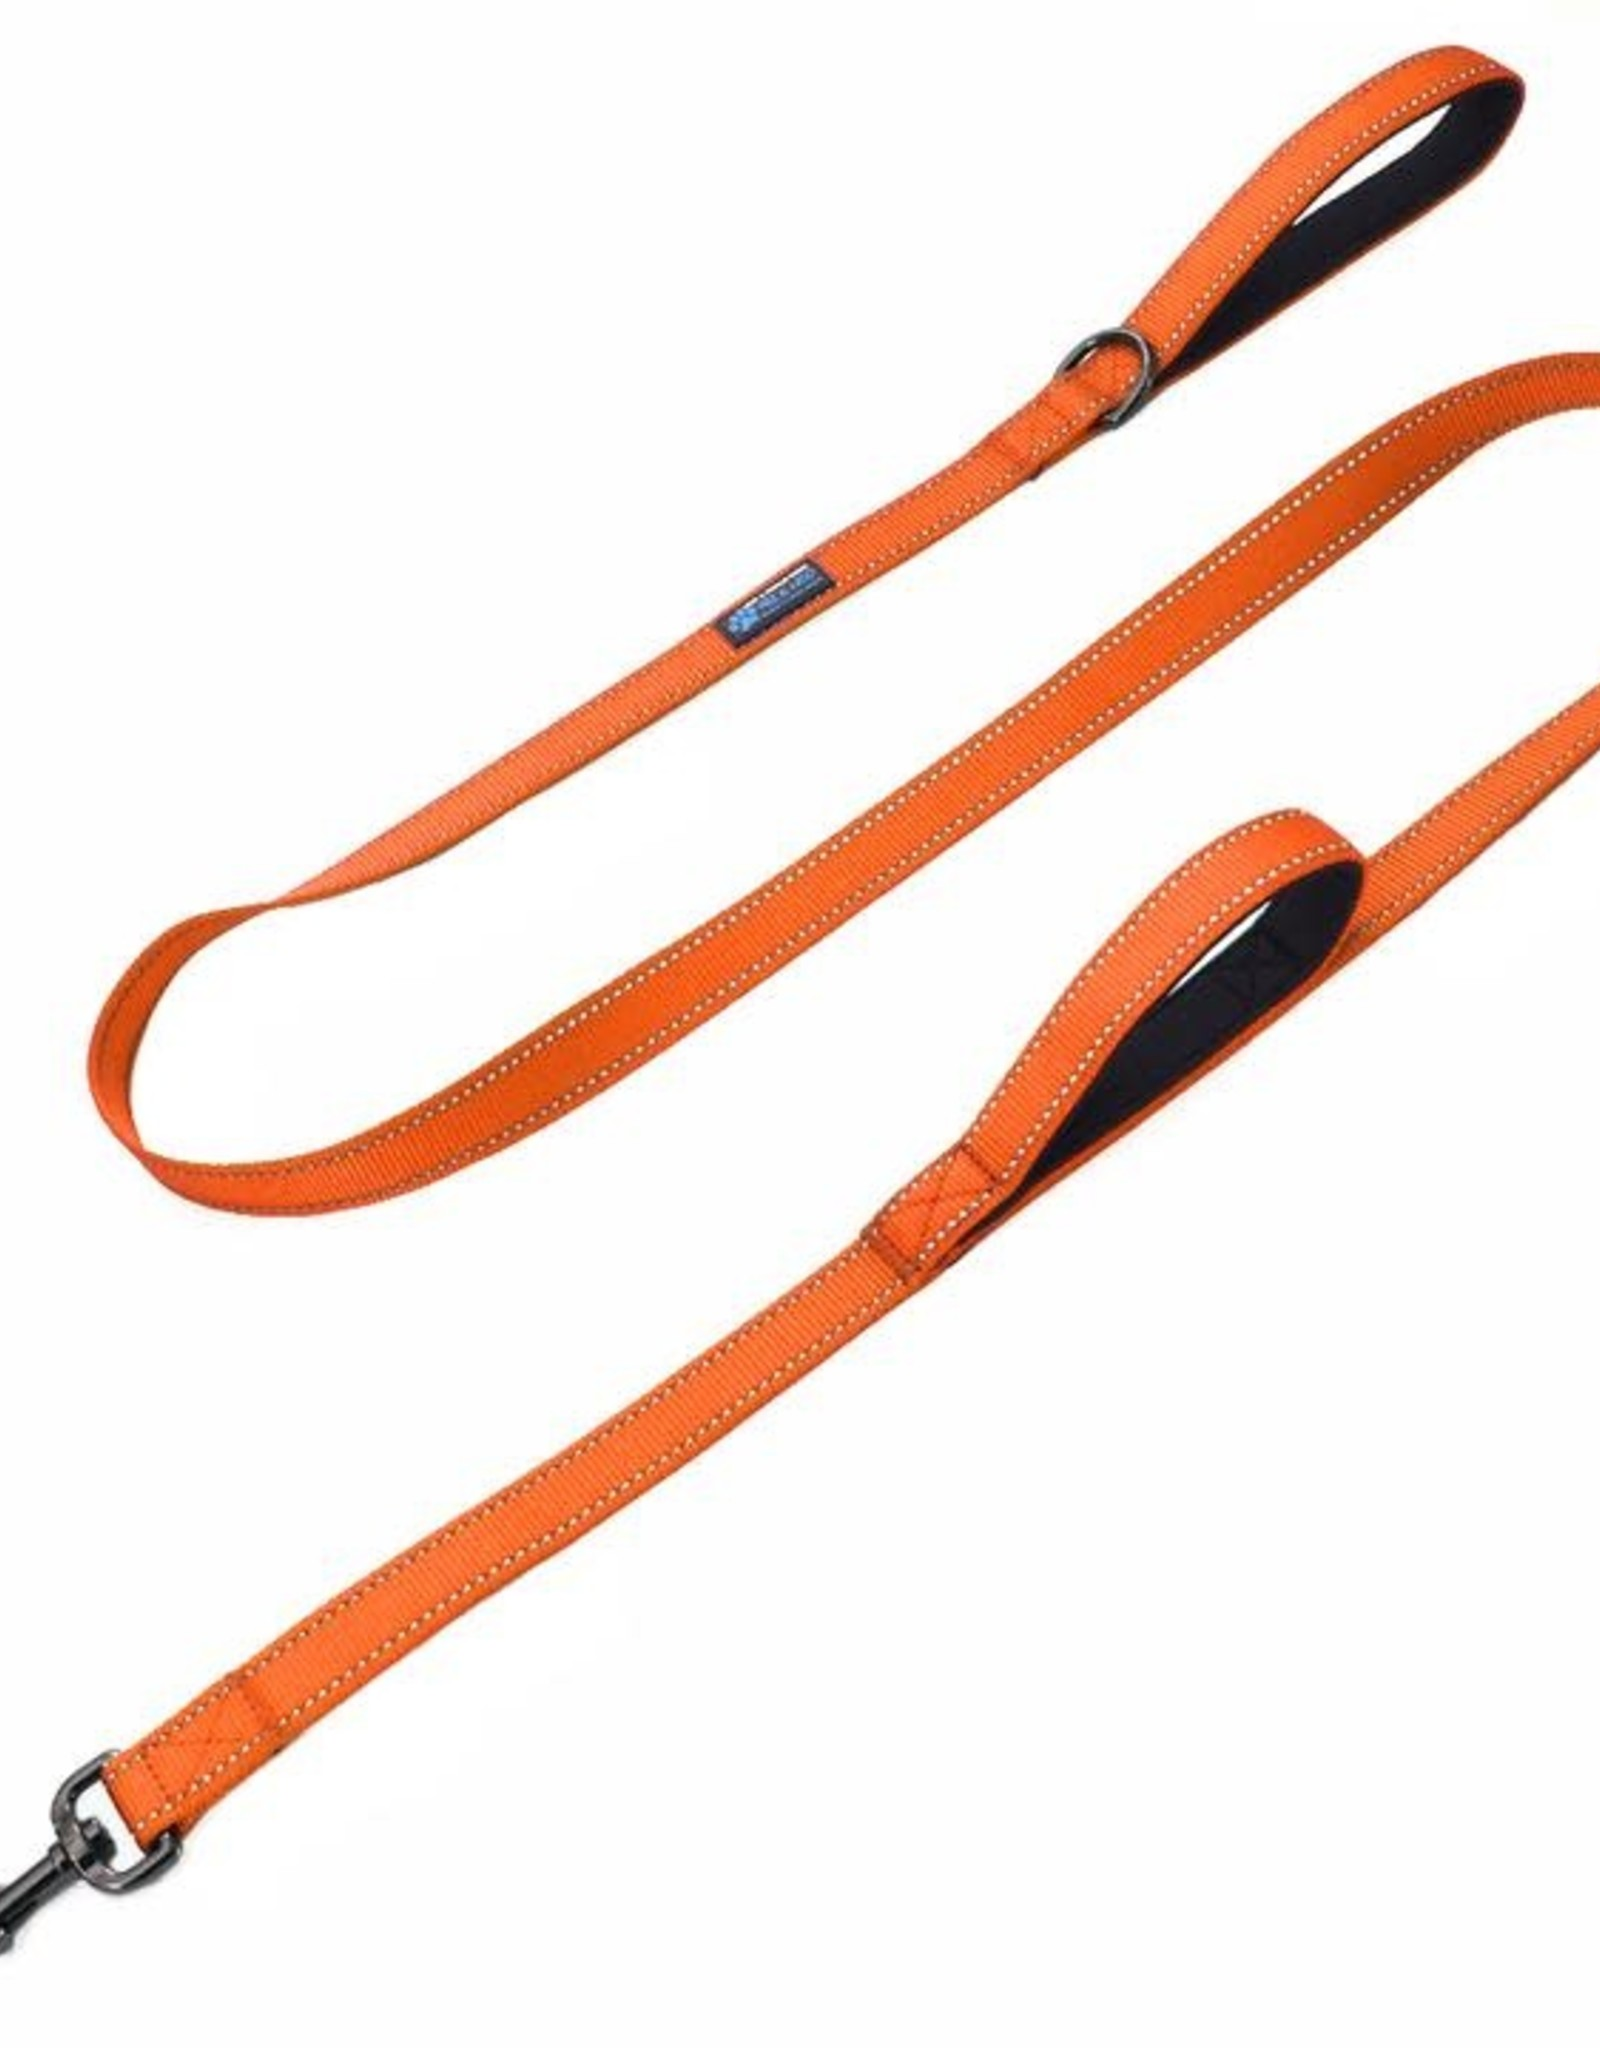 Max & Neo Double Handle Leash- Orange 6ft